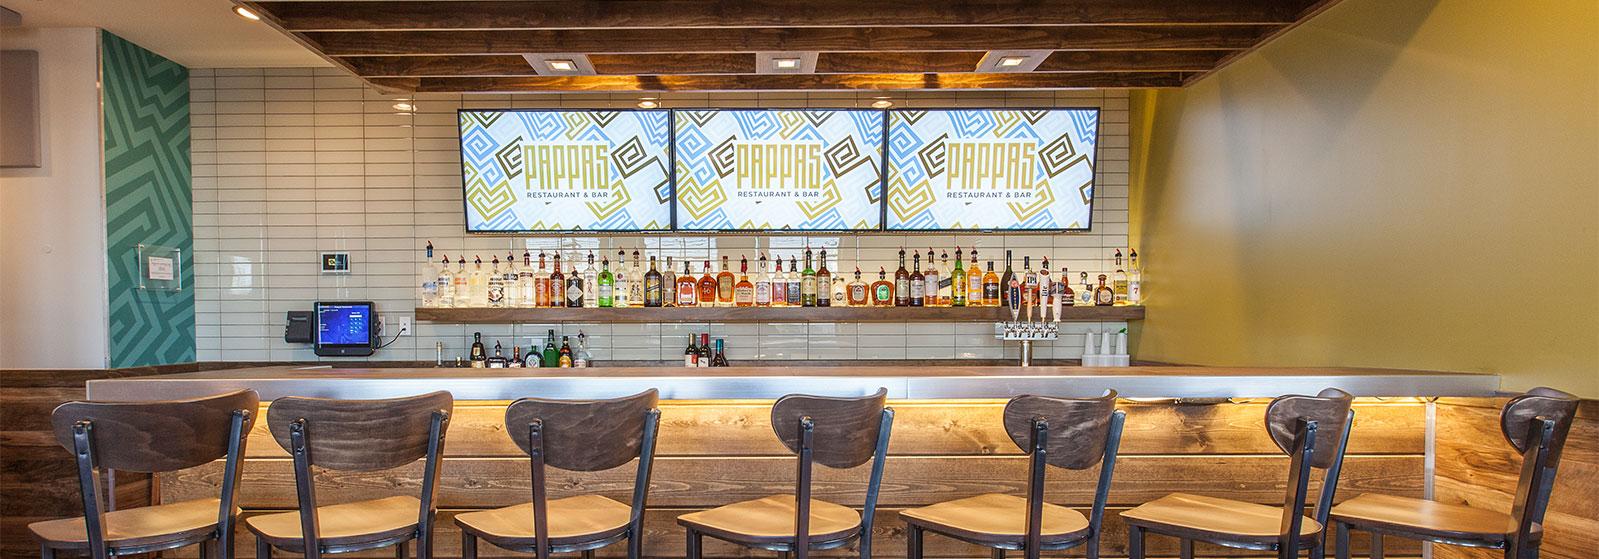 Pappas Restaurant & Bar